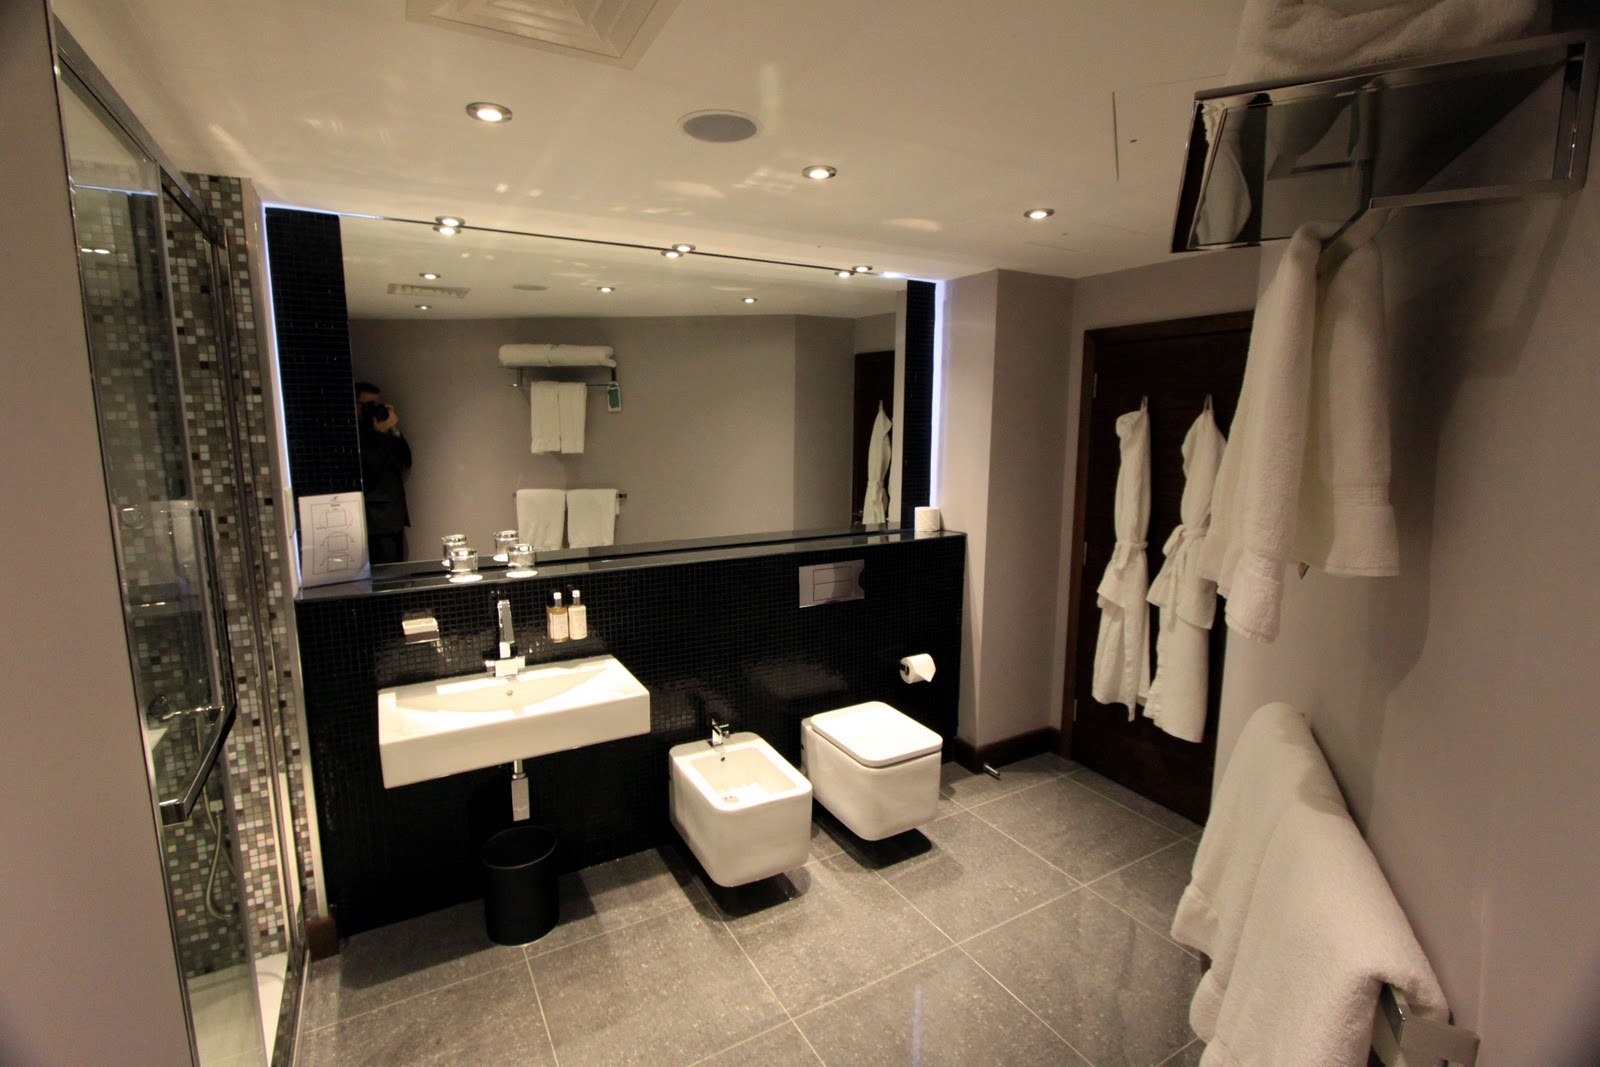 Hotel Rafayel Luxury Synonym Opulence Bliss Comfort Splendor Deligh